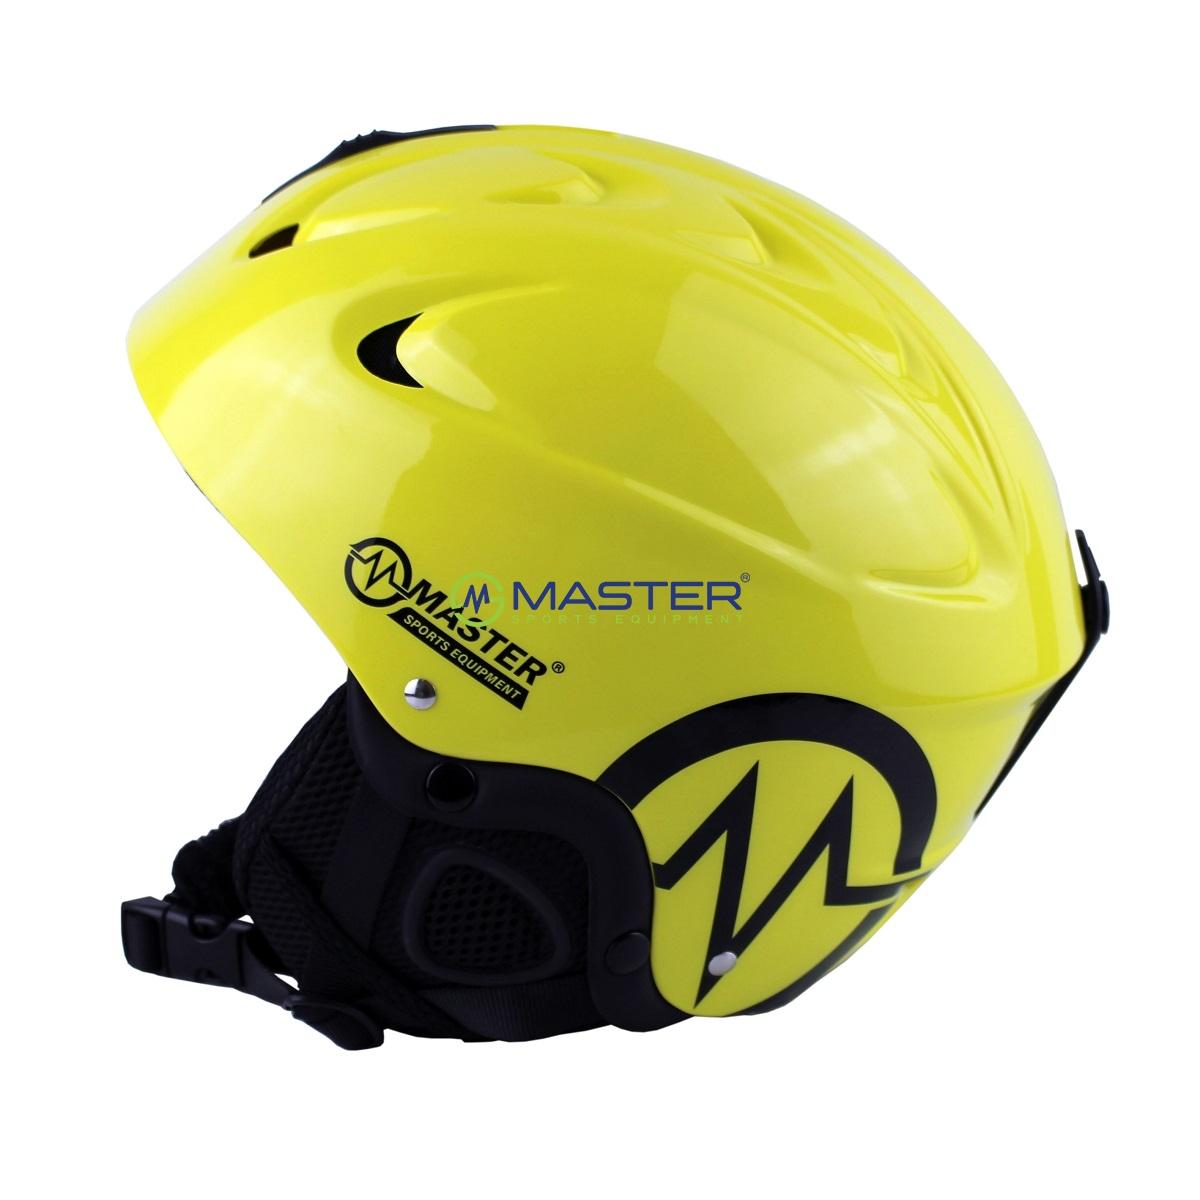 Lyžiarska prilba MASTER Freeze žltá. -16% b903db204a2